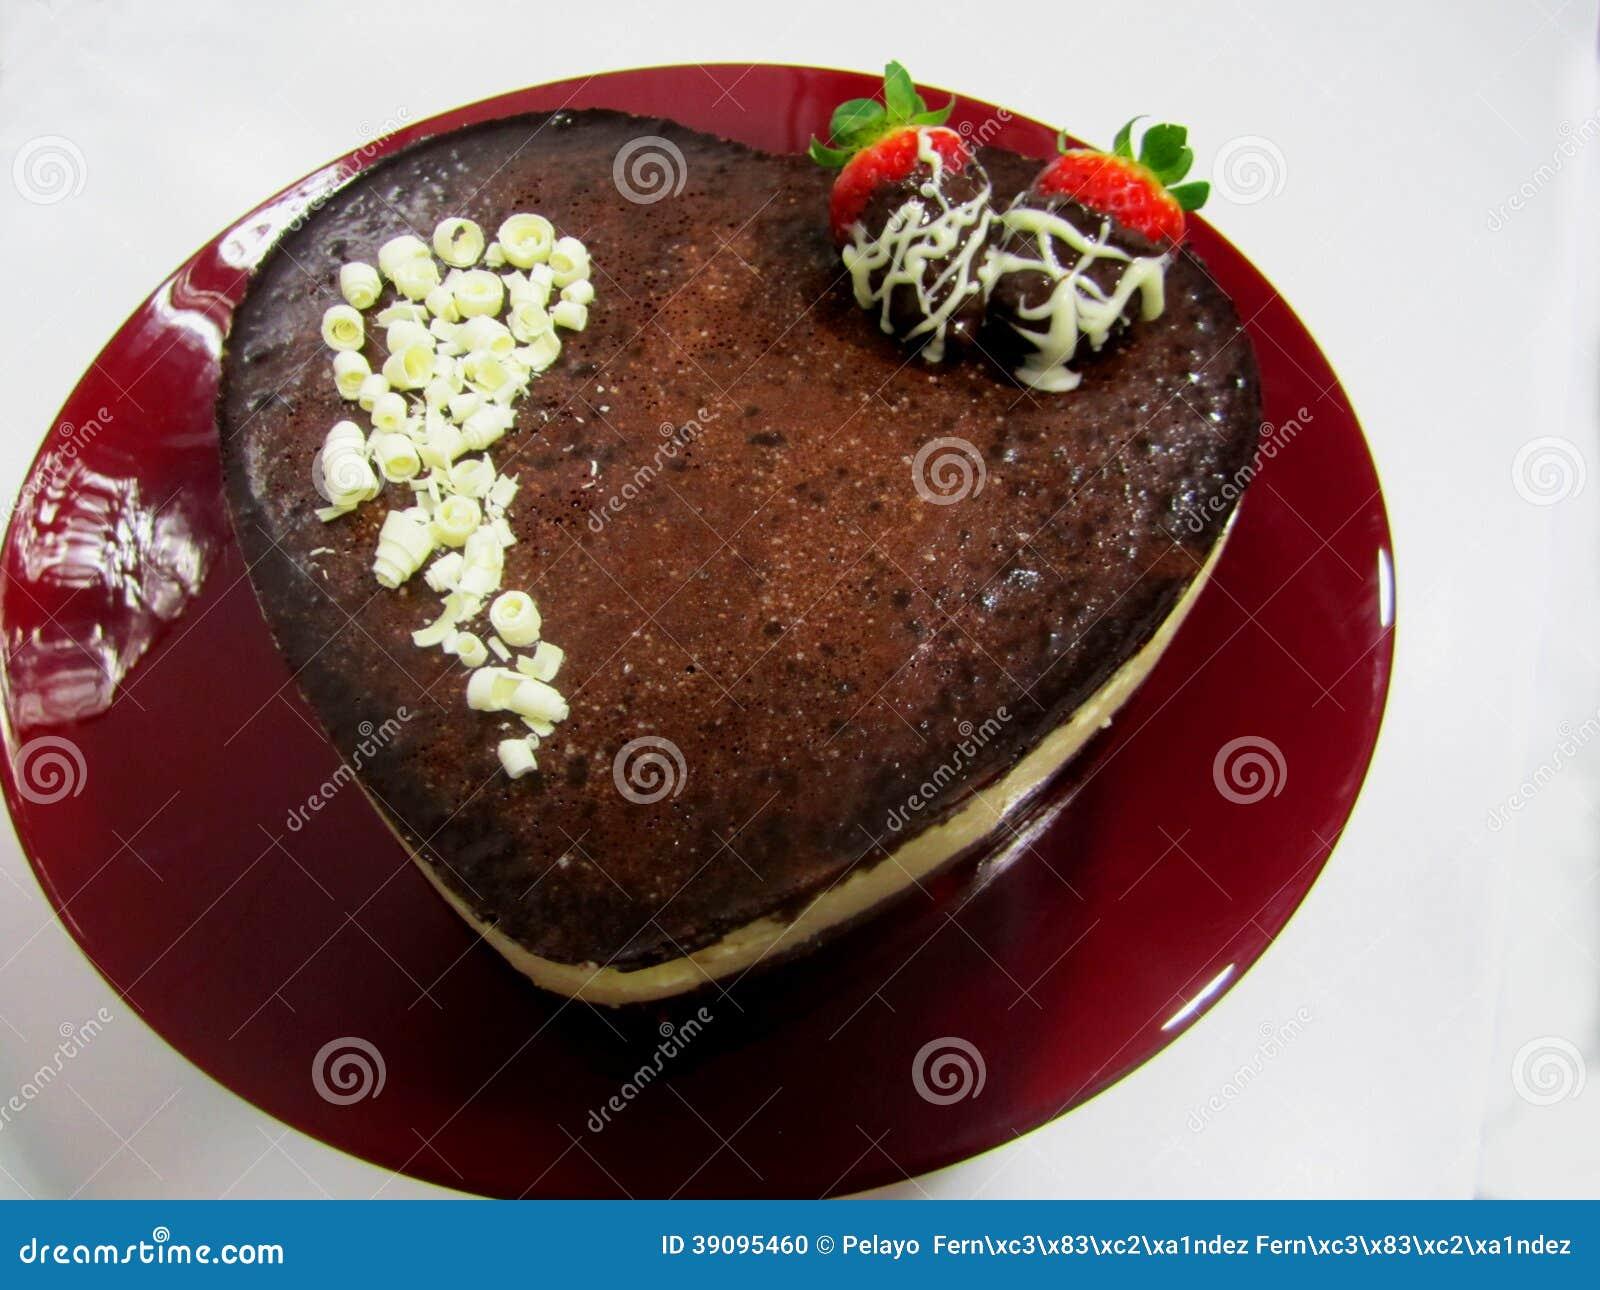 Download San Valentin Heart Chocolate Cake Stock Photo - Image of chocolate, postre: 39095460